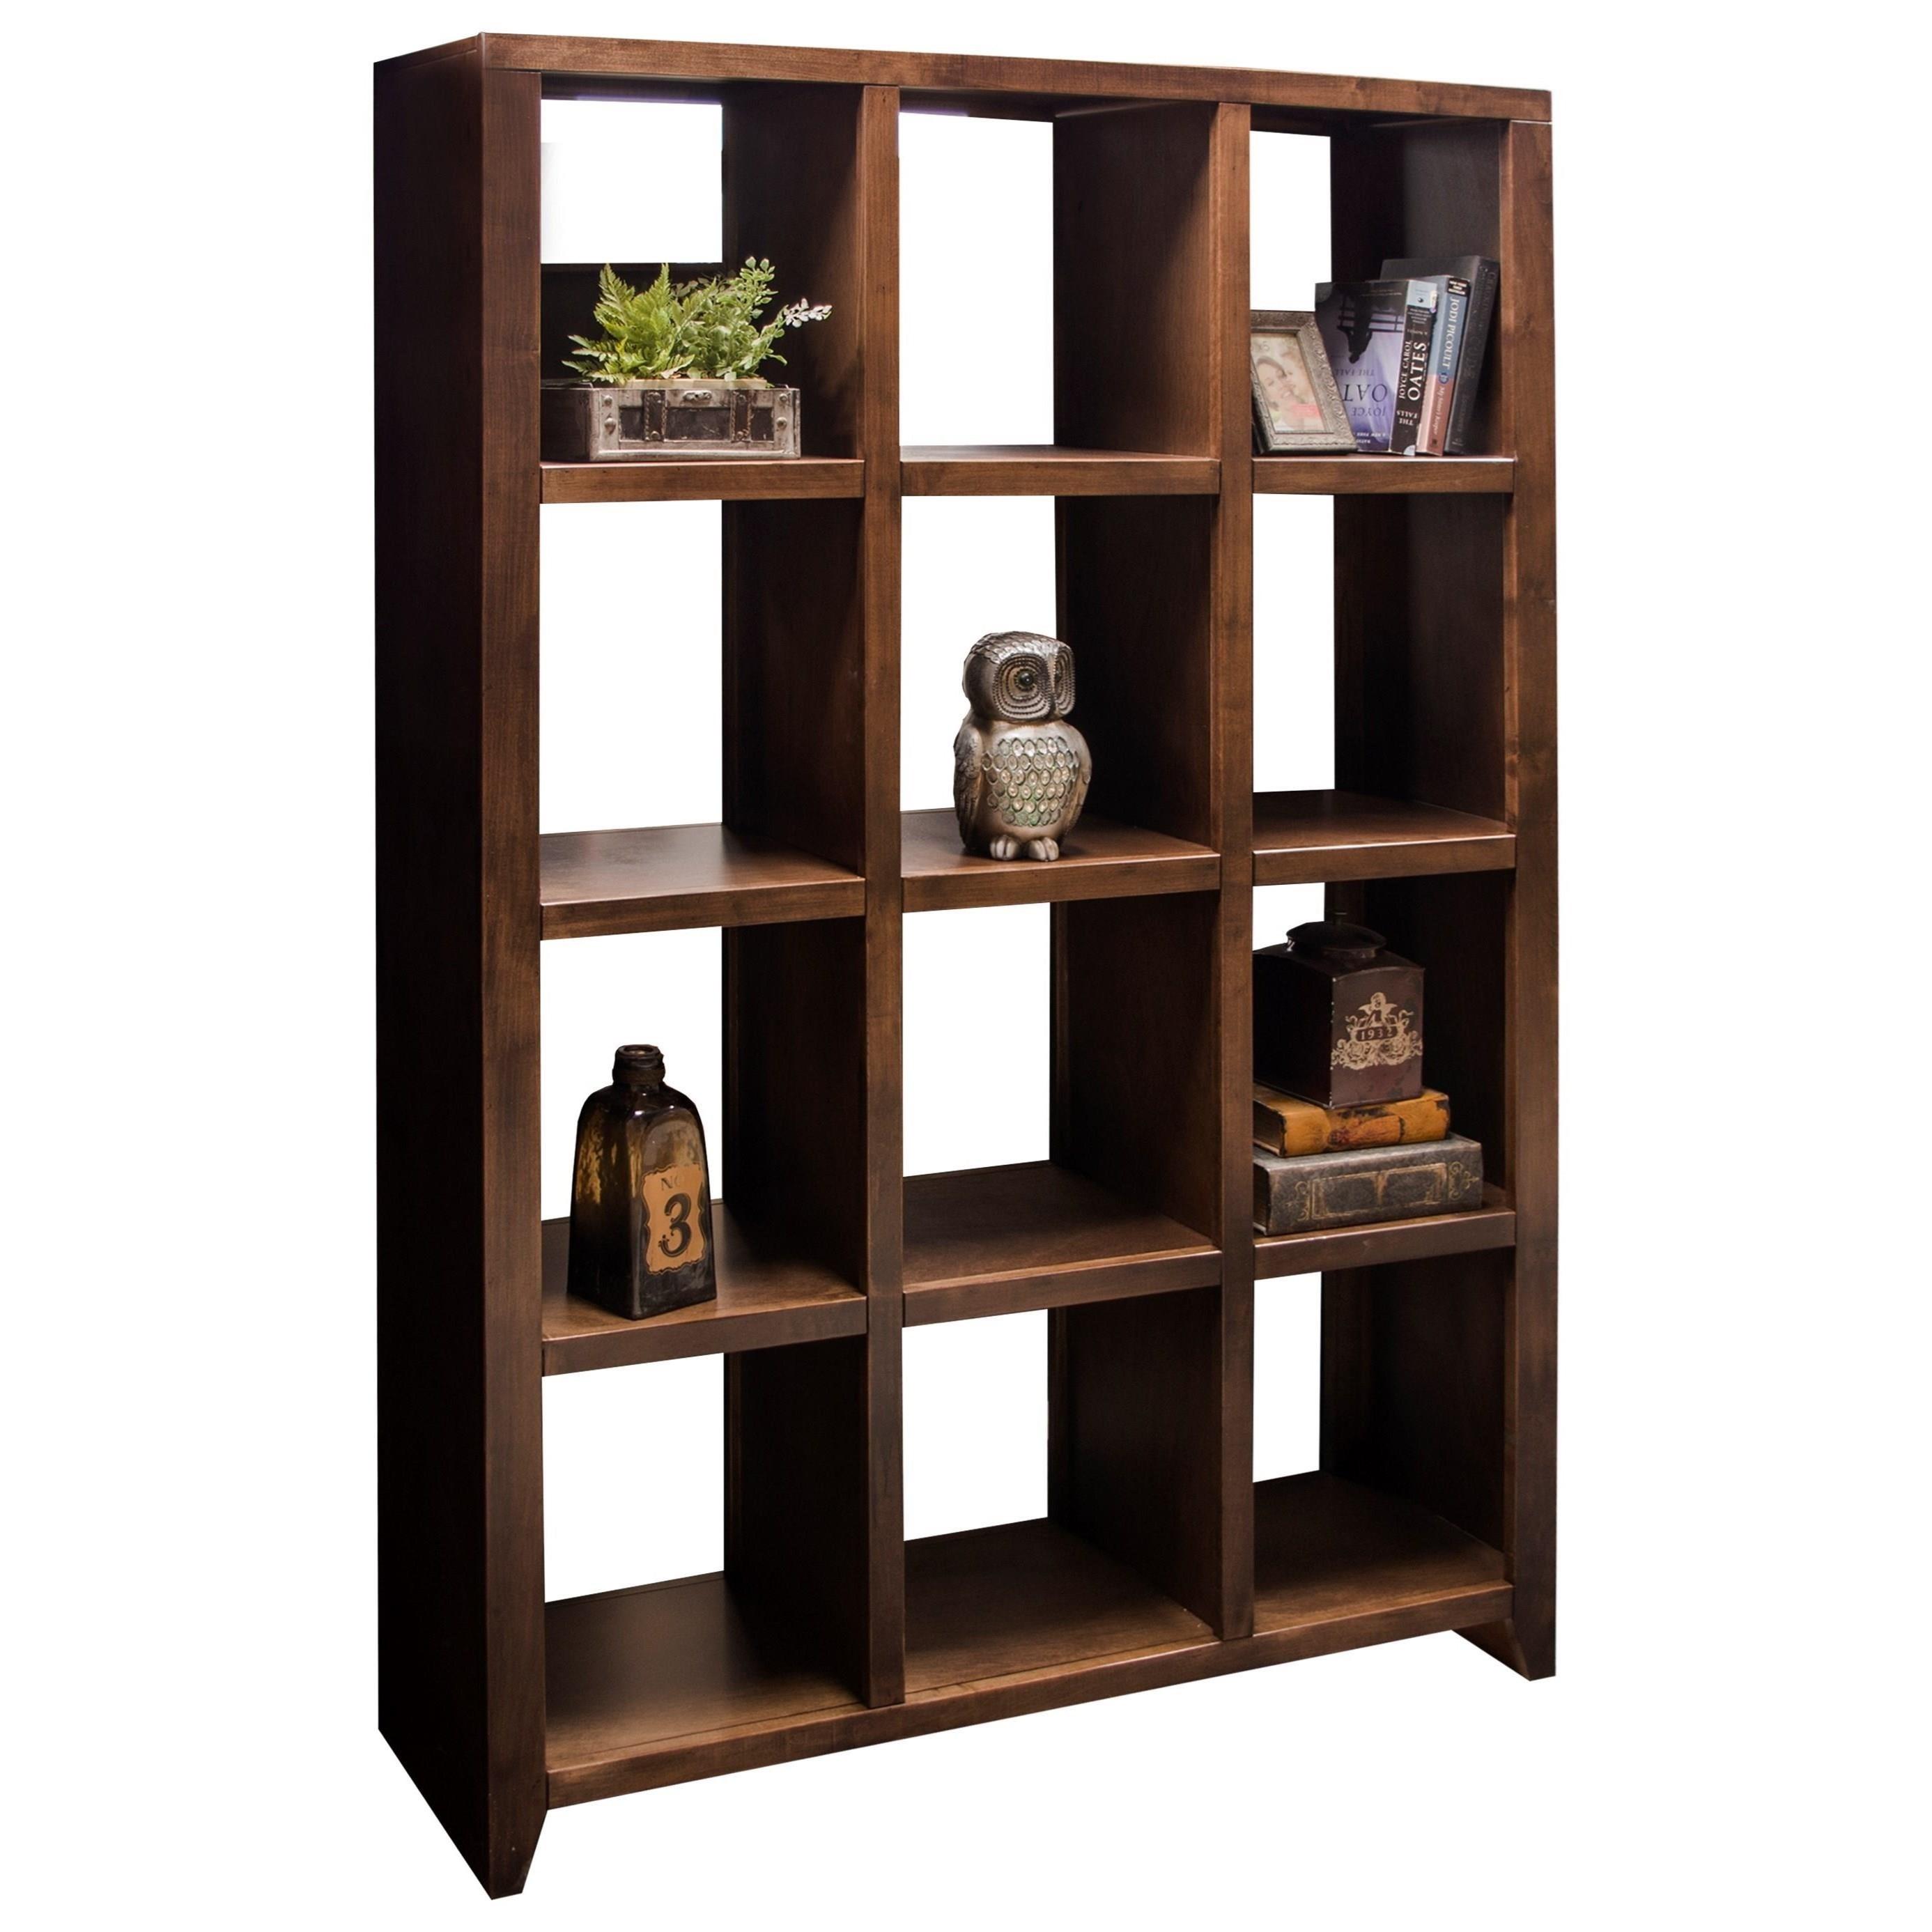 Legends furniture brownstone collection brownstone room - Open bookcase room divider ...